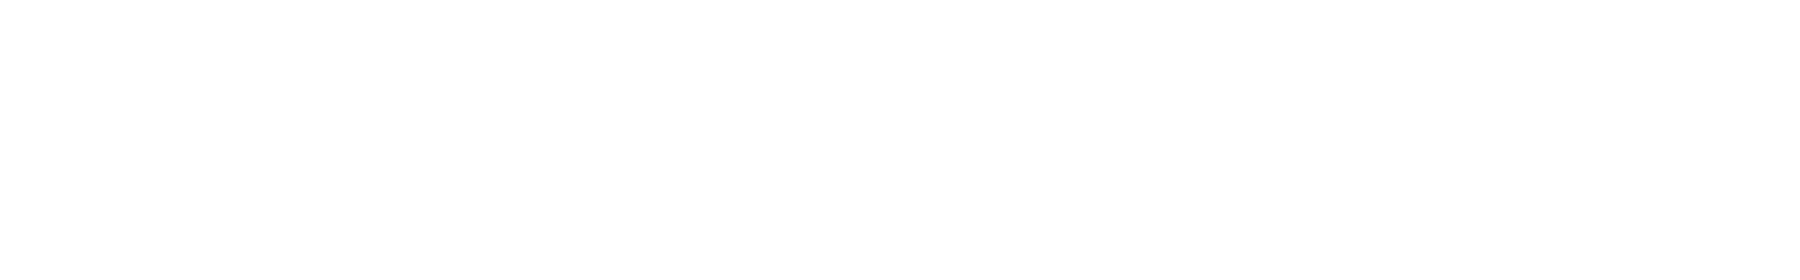 blbc cinedrumsb 130 03